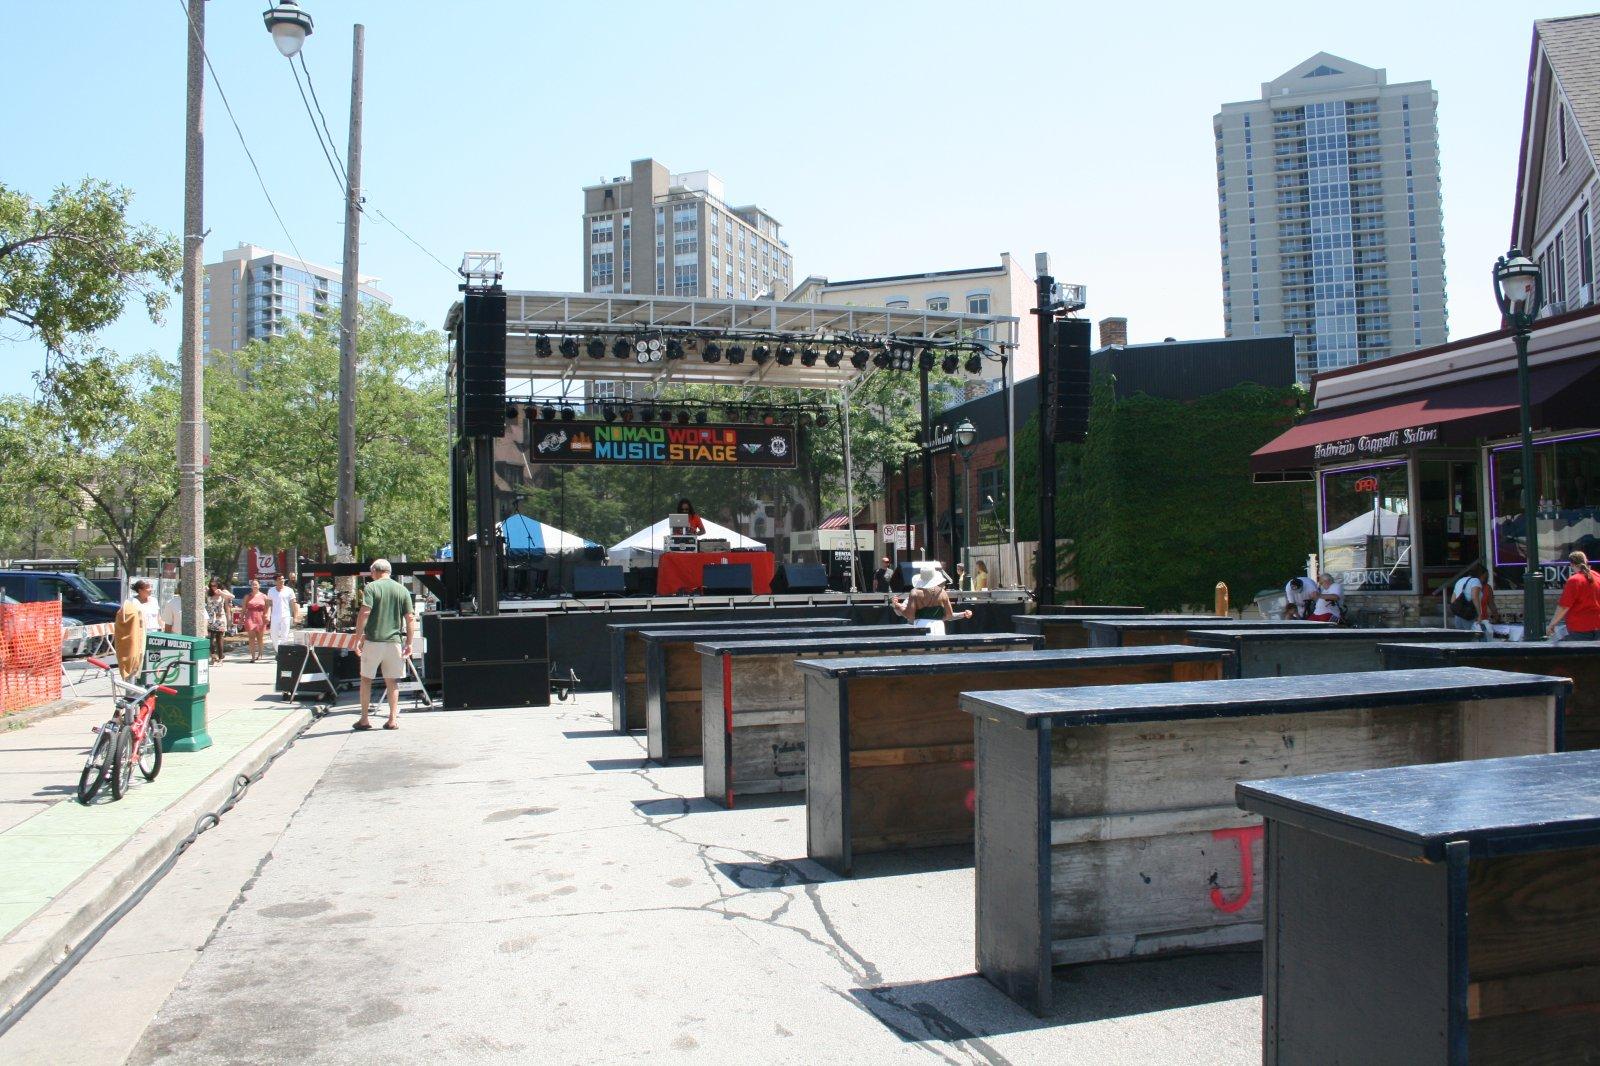 Nomad World Music Stage